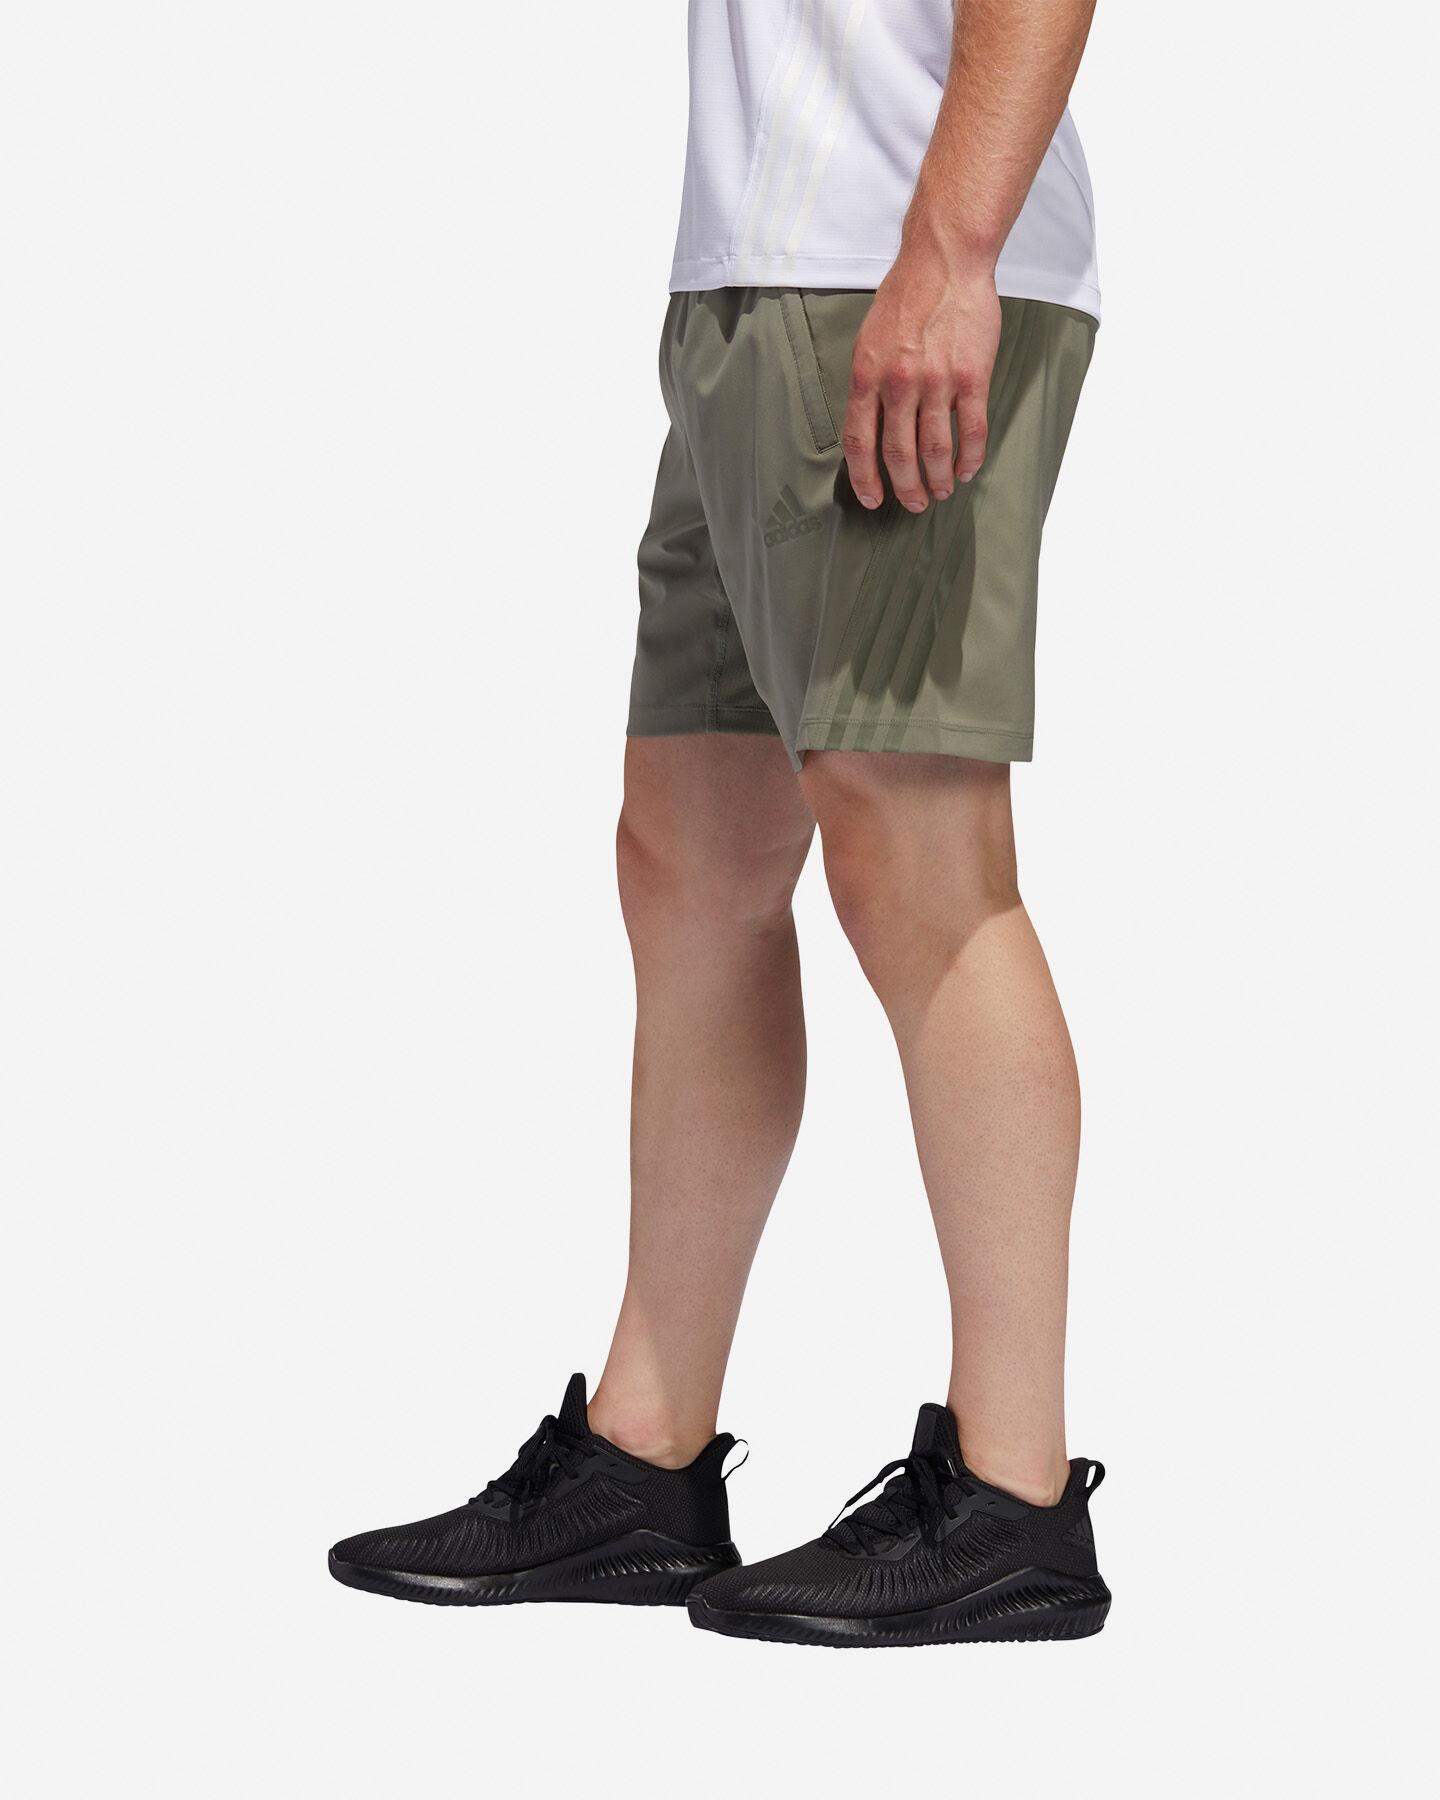 Pantalone training ADIDAS AEROREADY 3-STRIPES 8-INCH M S5154649 scatto 3